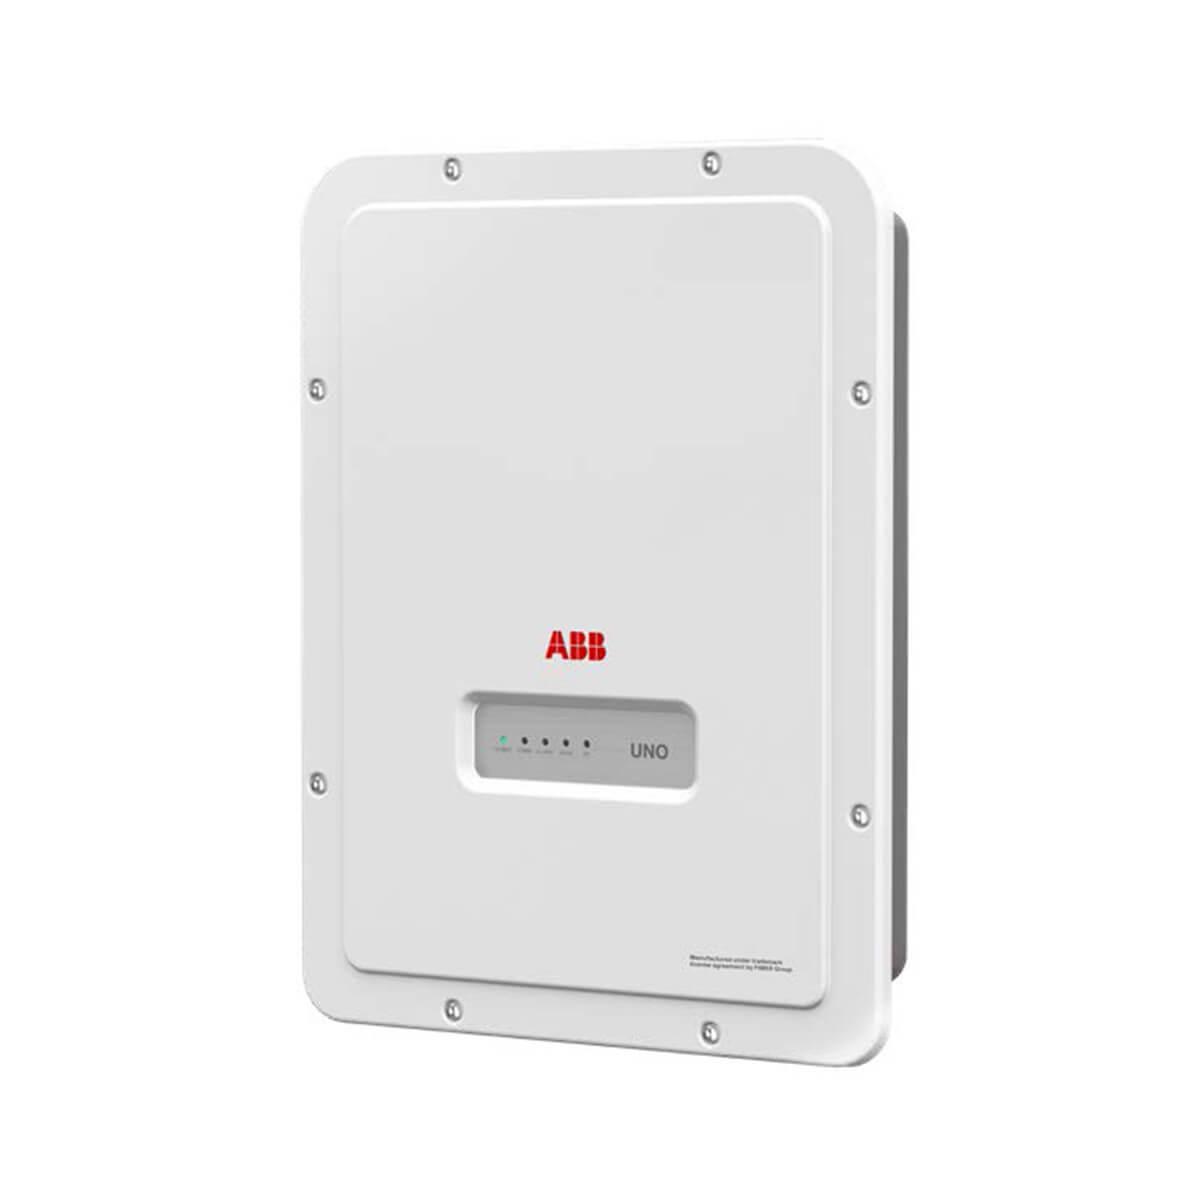 abb fimer 1.2kW inverter, abb fimer uno-dm 1.2kW inverter, abb fimer uno-dm-1.2-tl-plus-q inverter, abb fimer uno-dm-1.2-tl-plus-q, abb fimer uno-dm 1.2 kW, ABB FIMER 1.2 kW